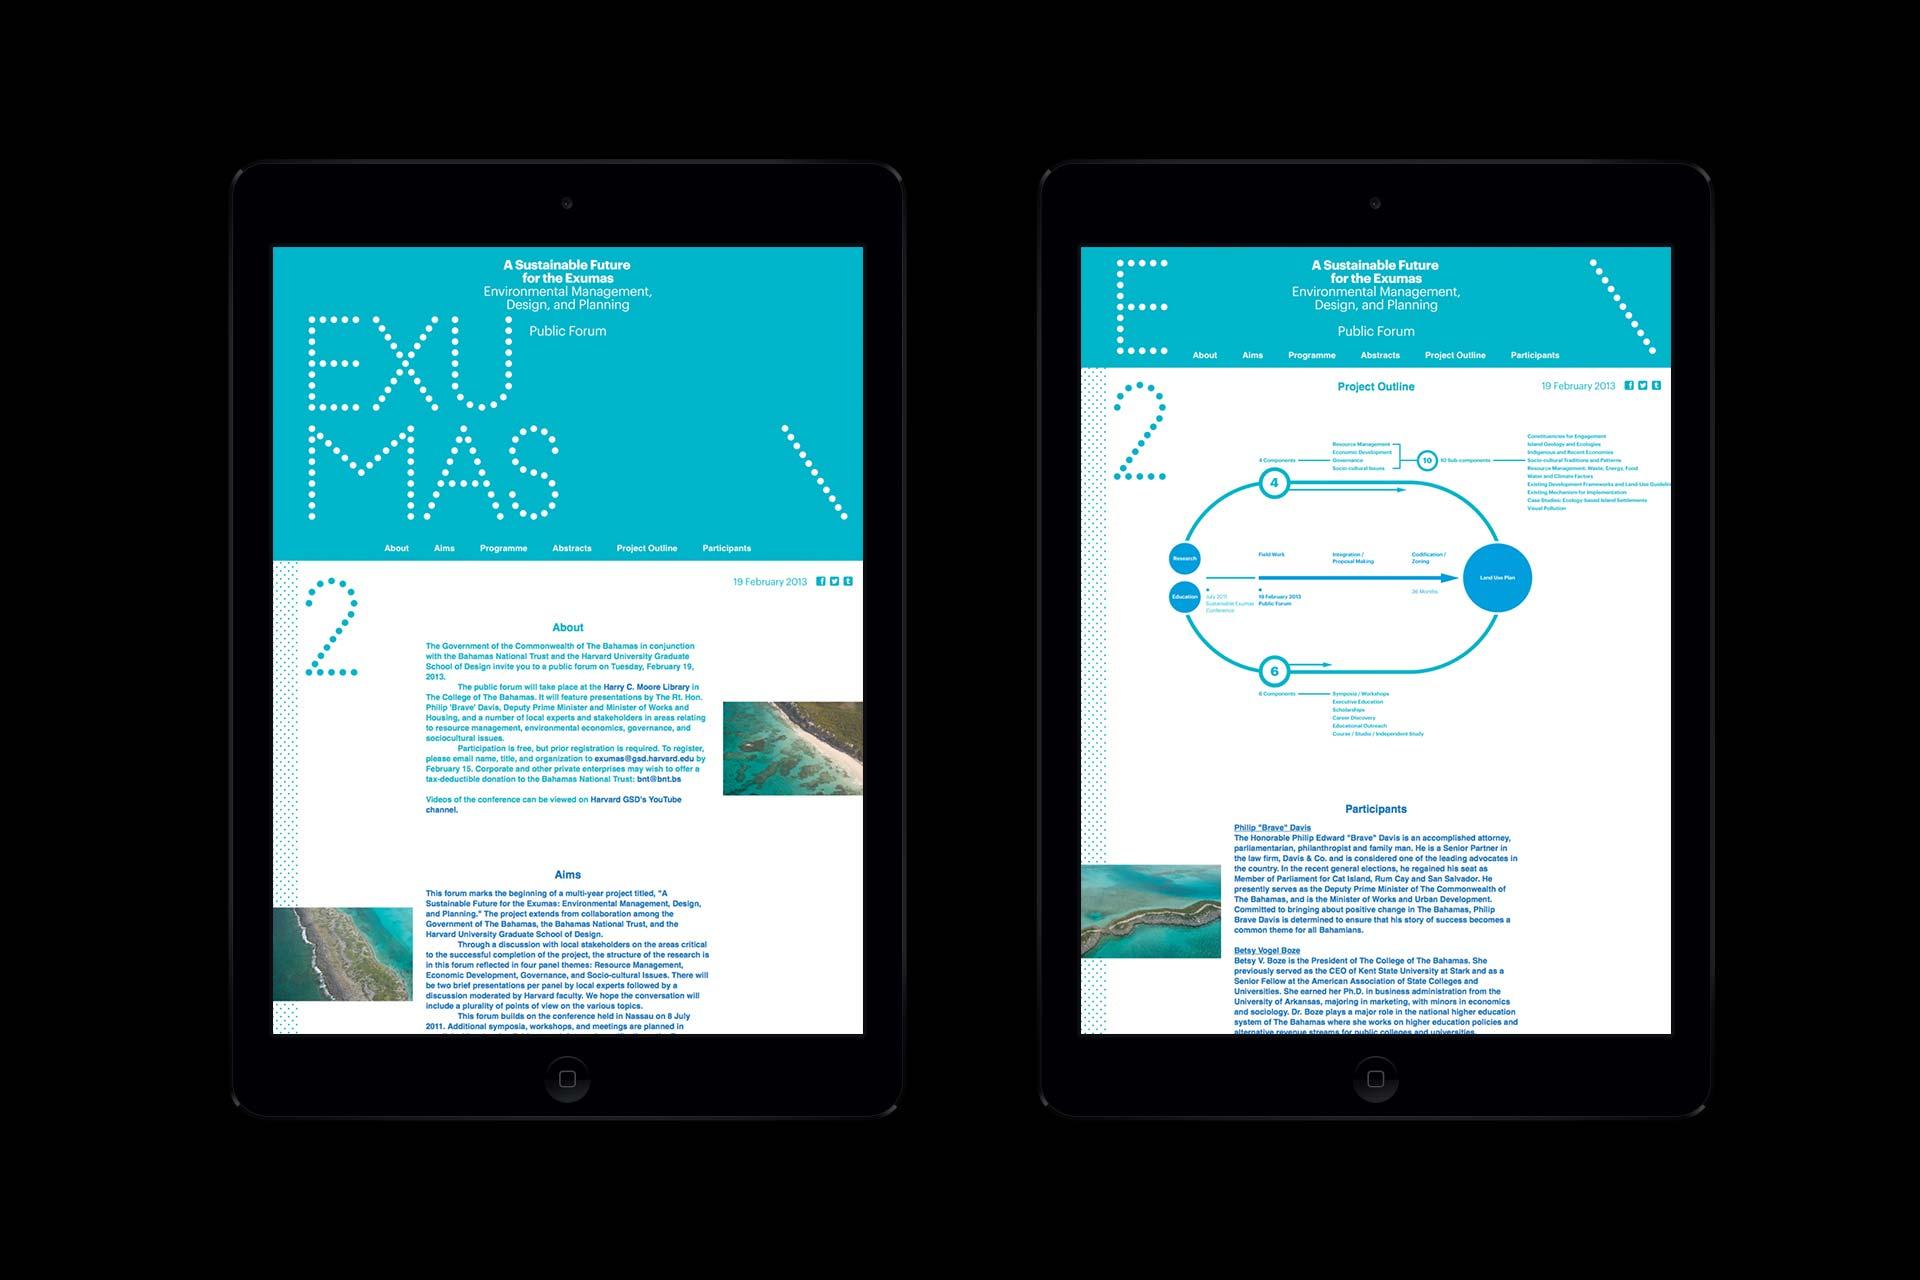 A Sustainable Future for Exuma